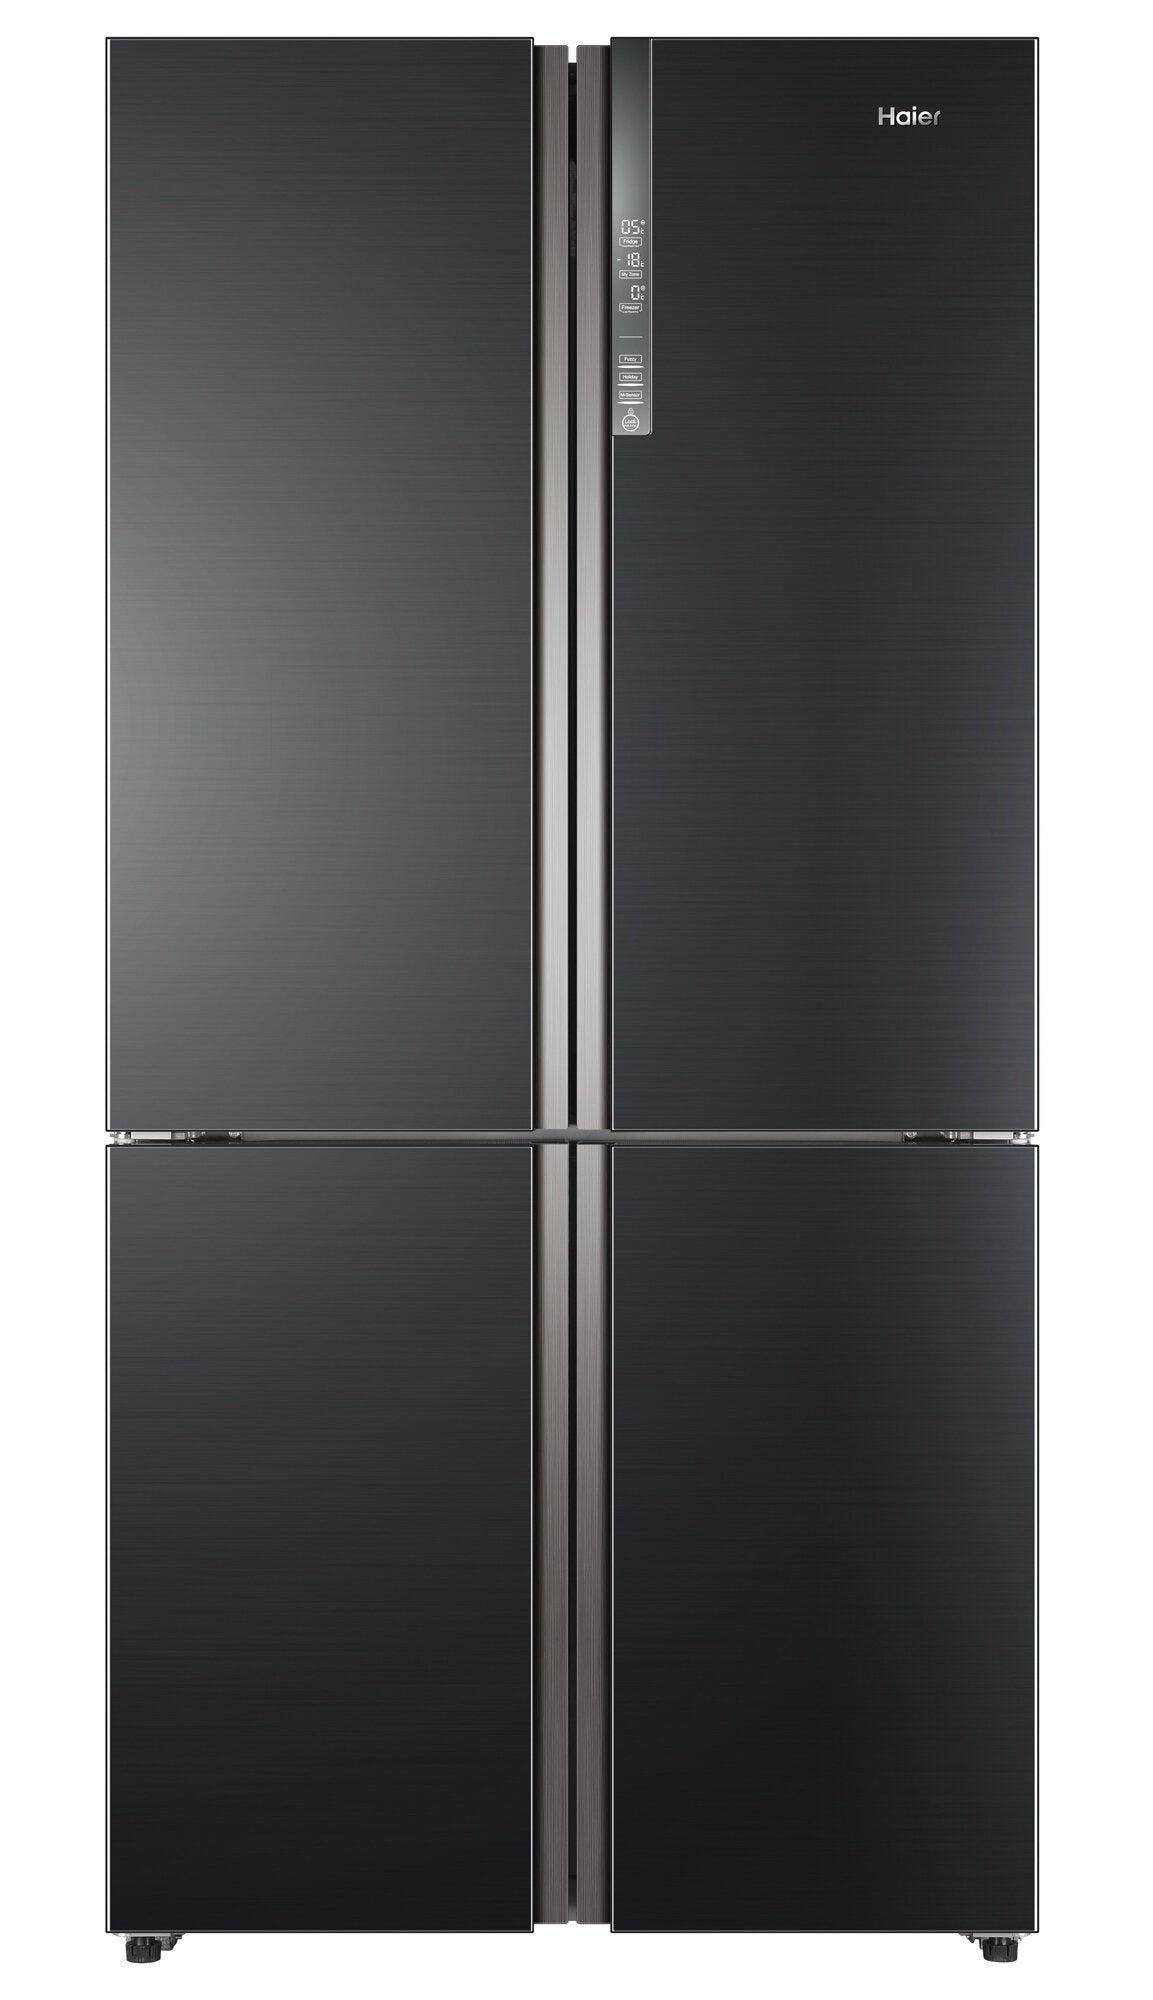 Haier HRF700YCX Refrigerator